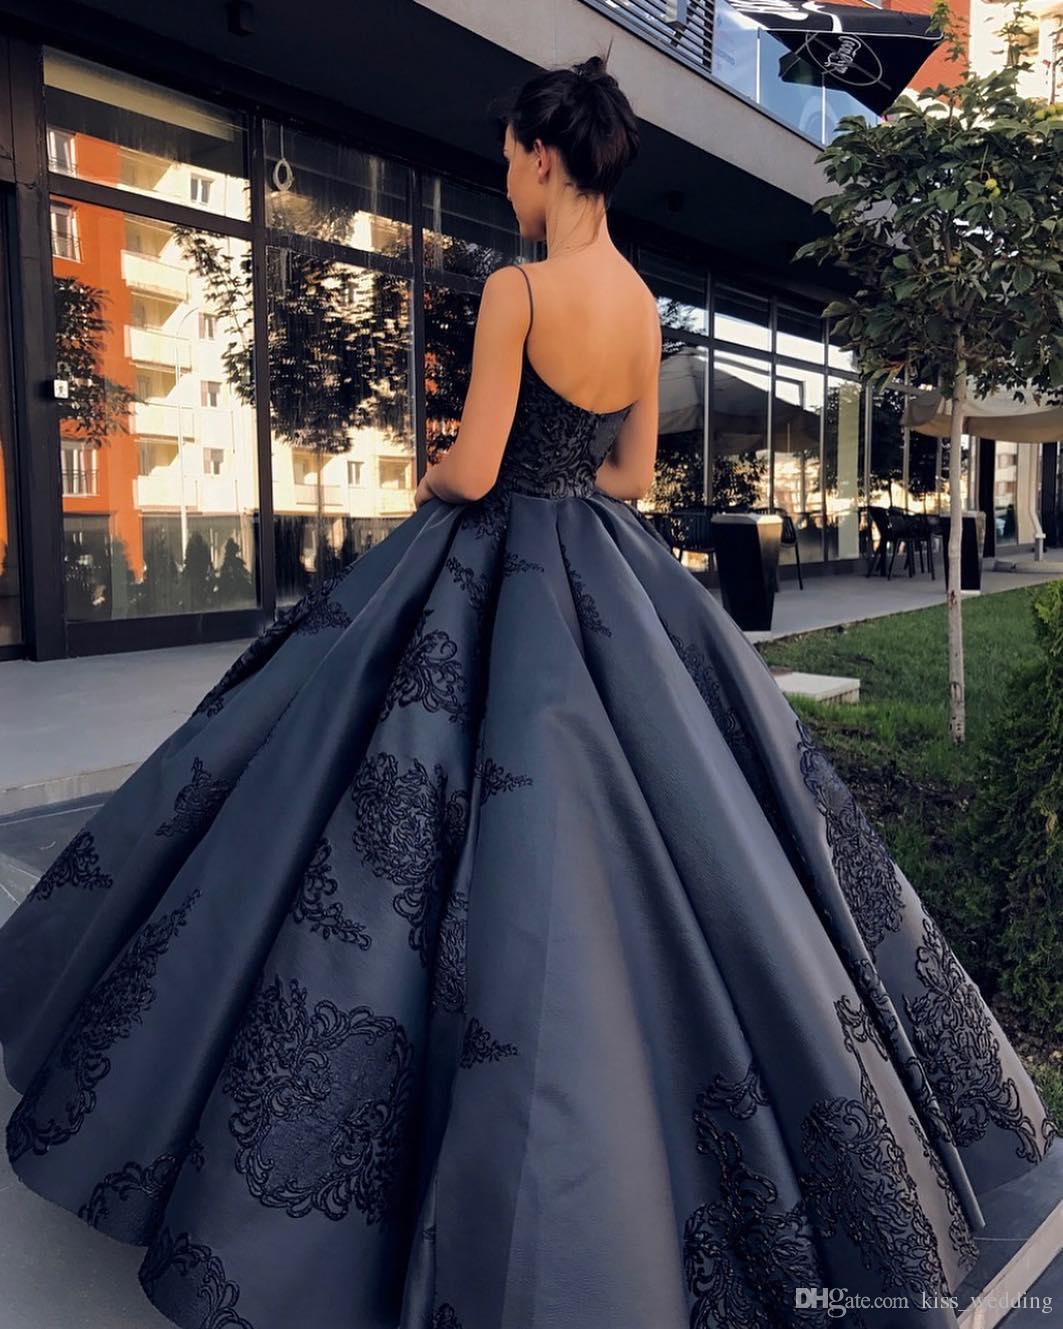 2017 New Design Open Back Evening Dresses Black Gowns Beaded Party Satin Appliques Full Length Sexy Spaghetti Straps Vestidos Festa